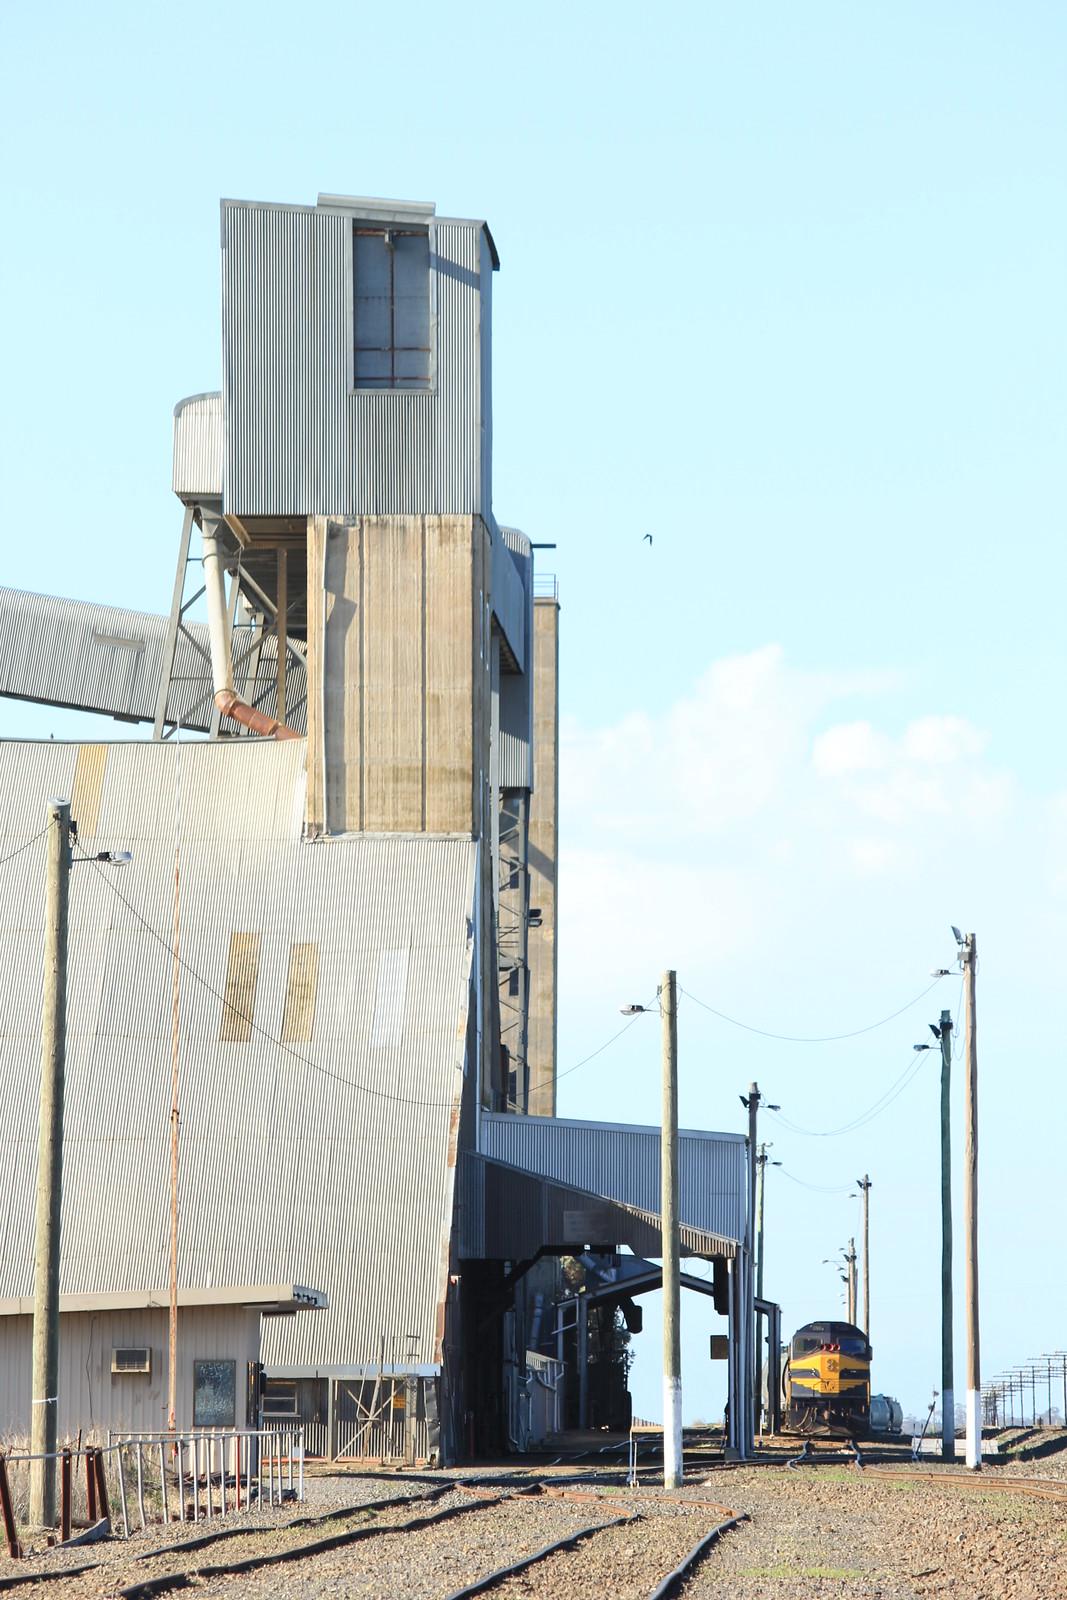 C501 shutdown on its grain train next to the Marmalake grain loader by bukk05